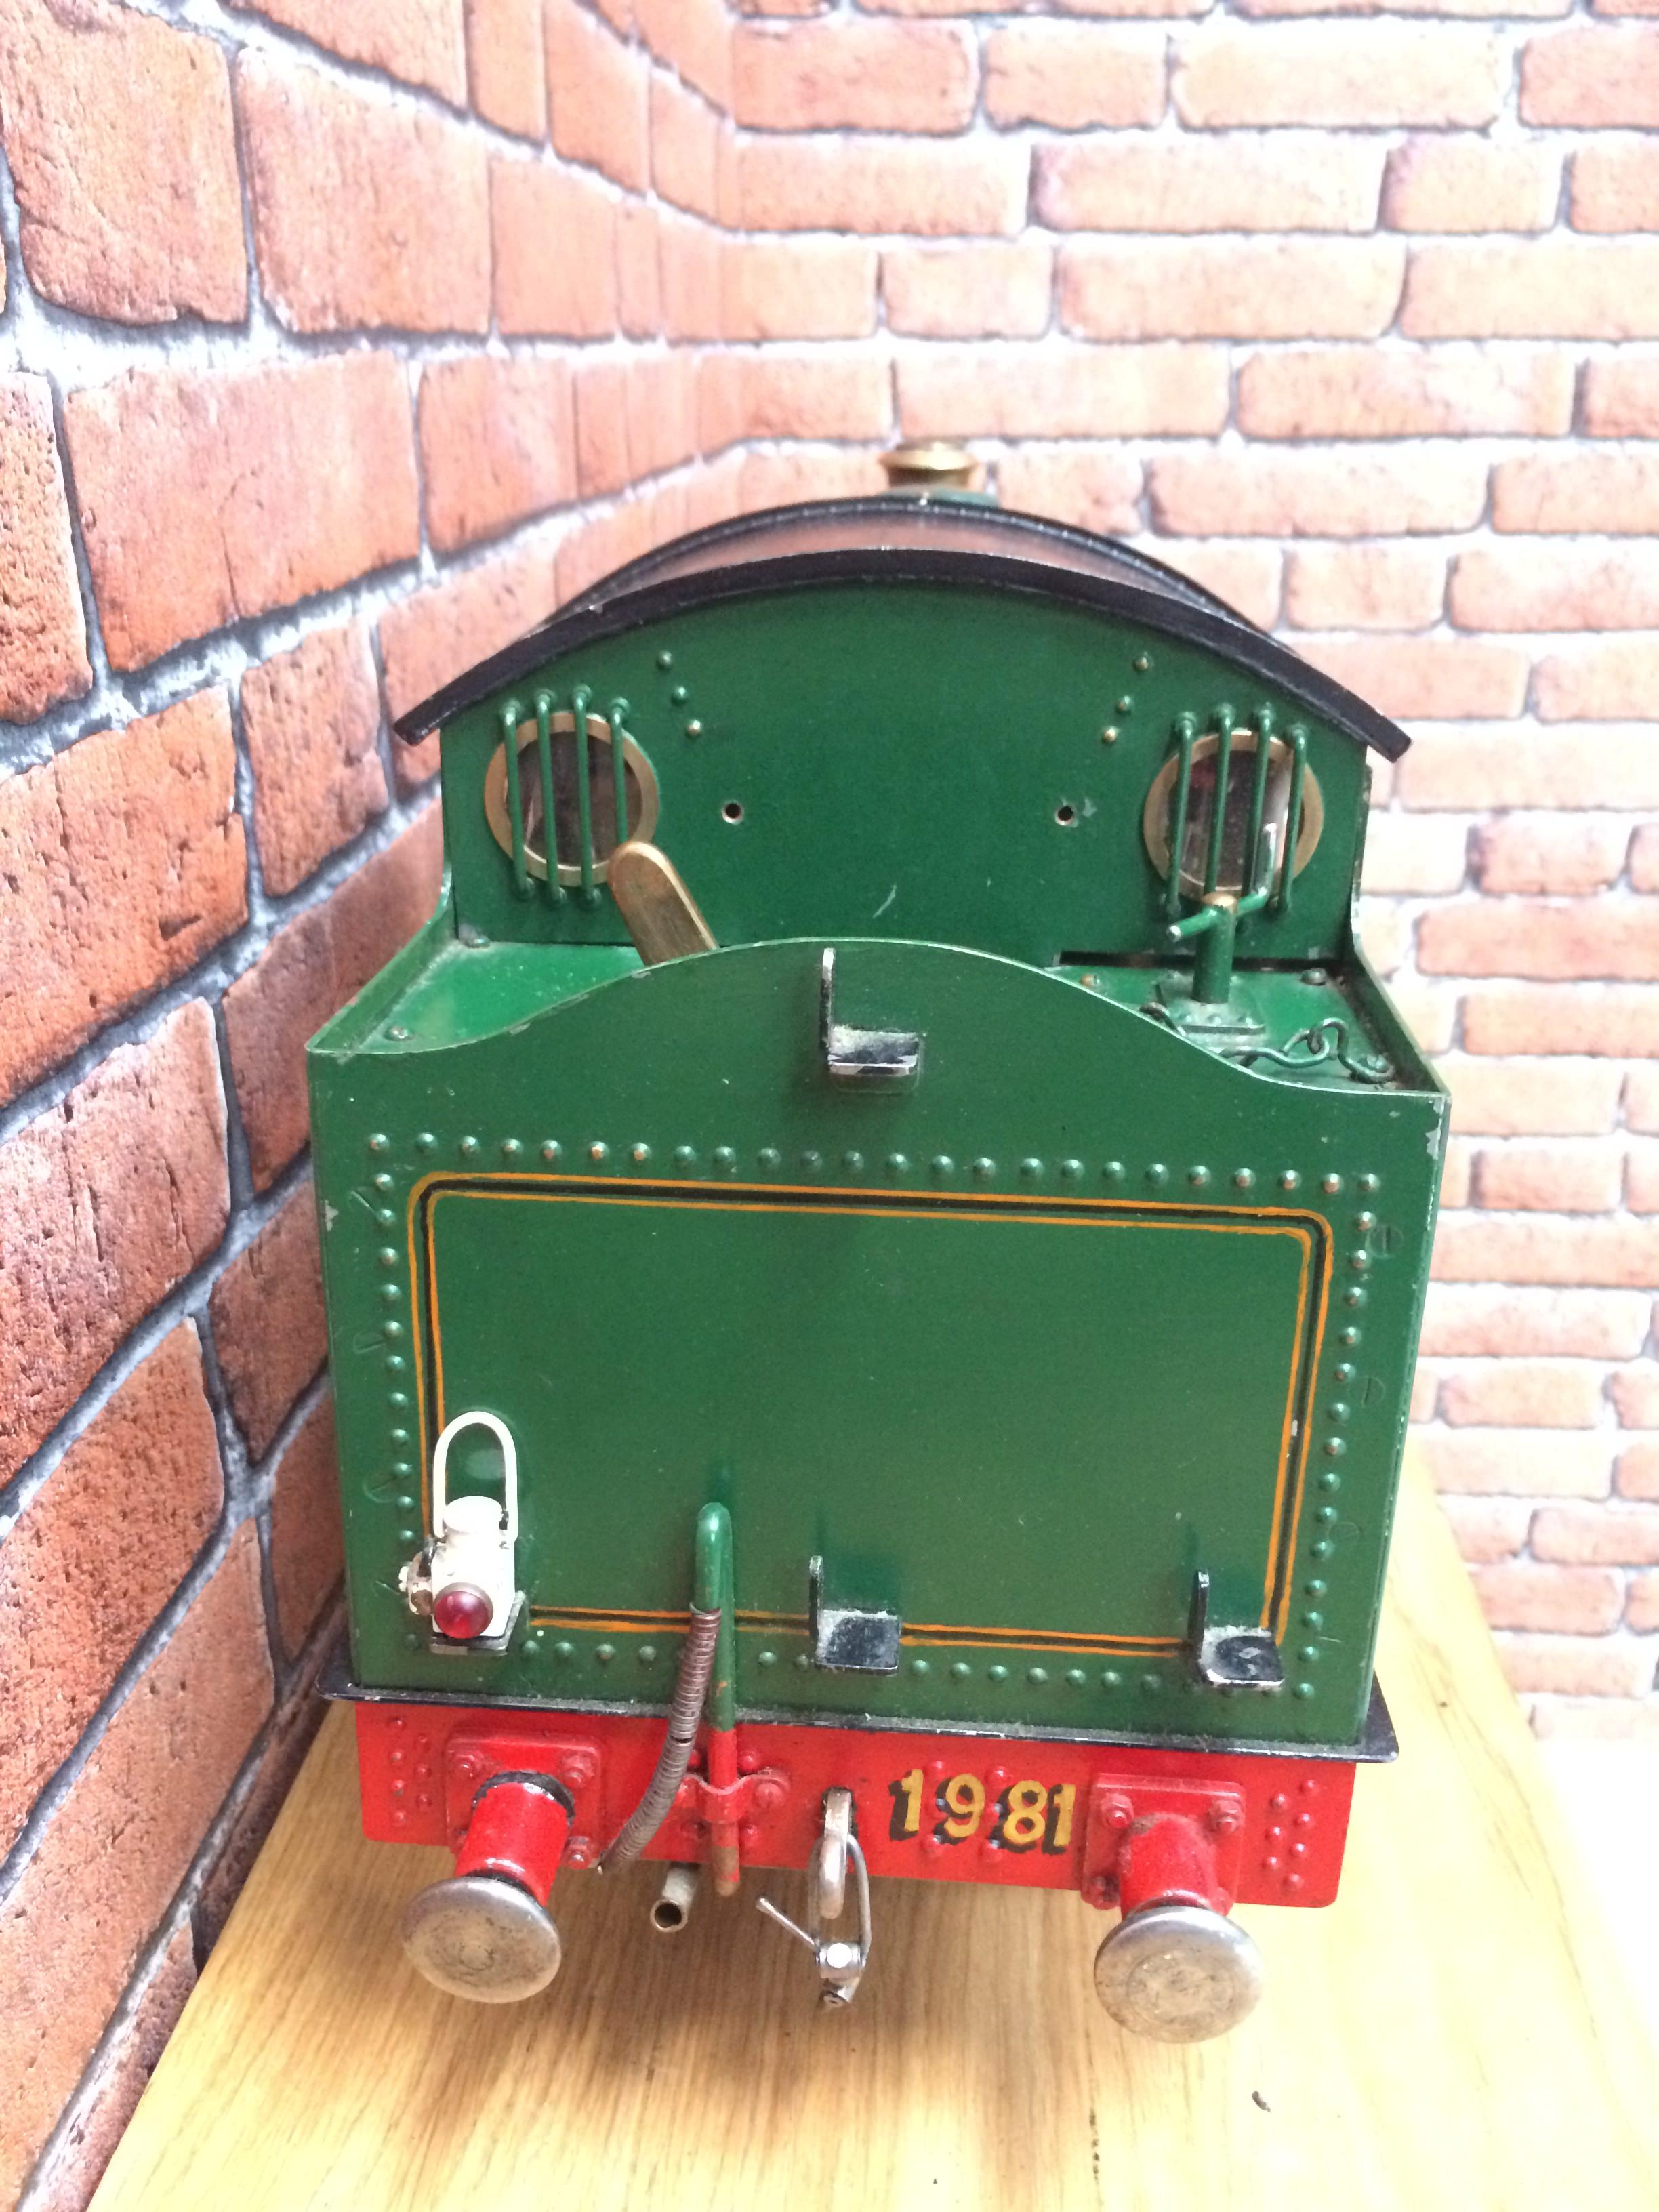 test 3 inch gauge freelance live steam tank engine for sale 15